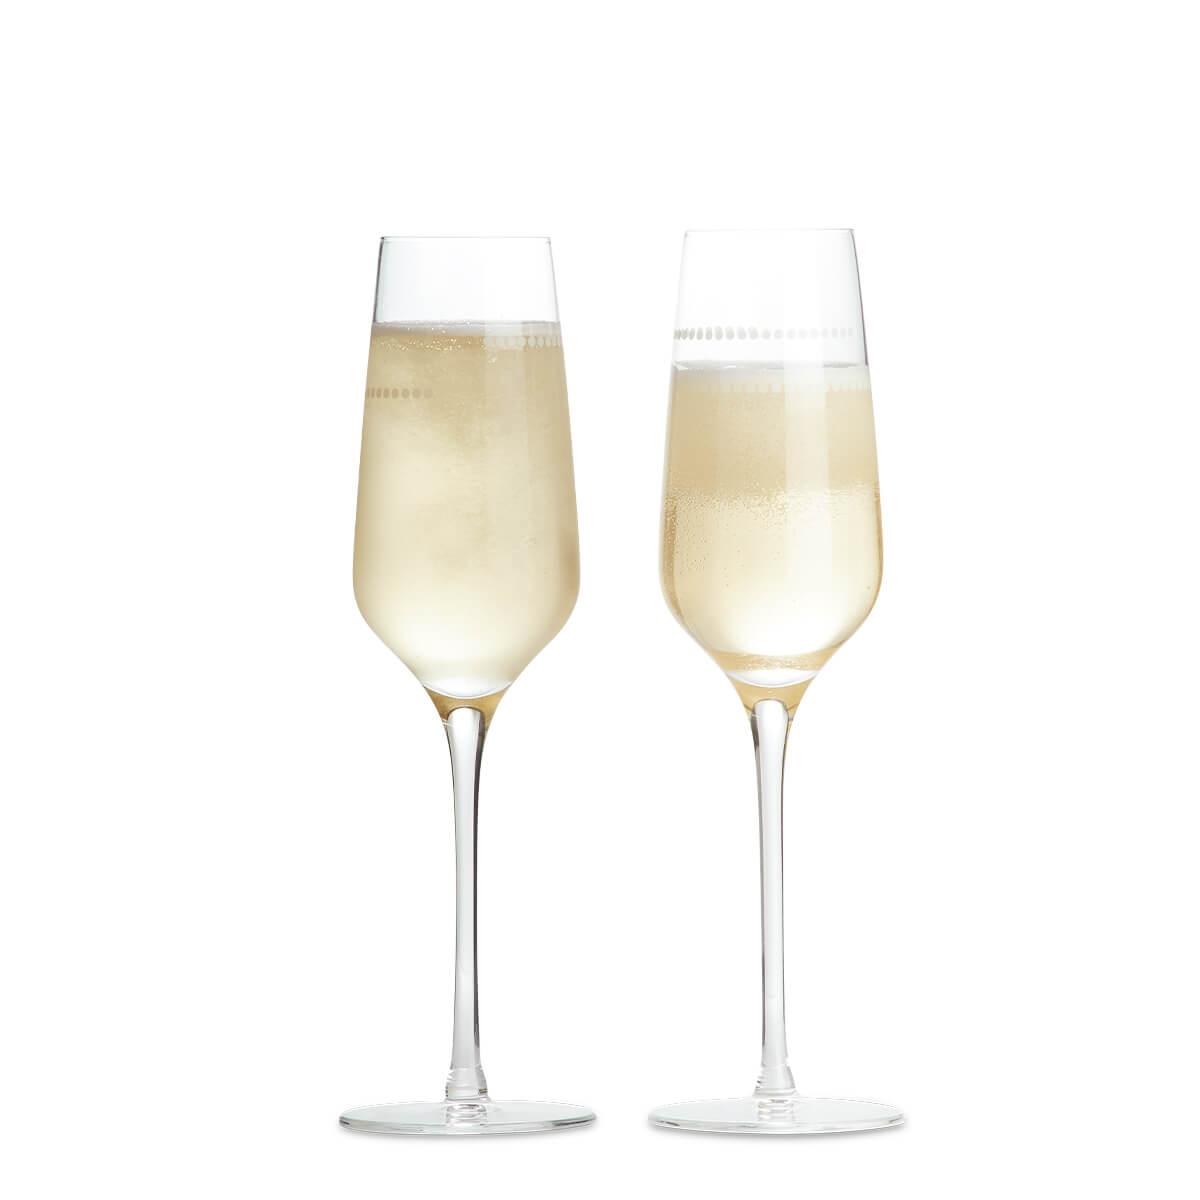 Portion Control Champagne Flutes